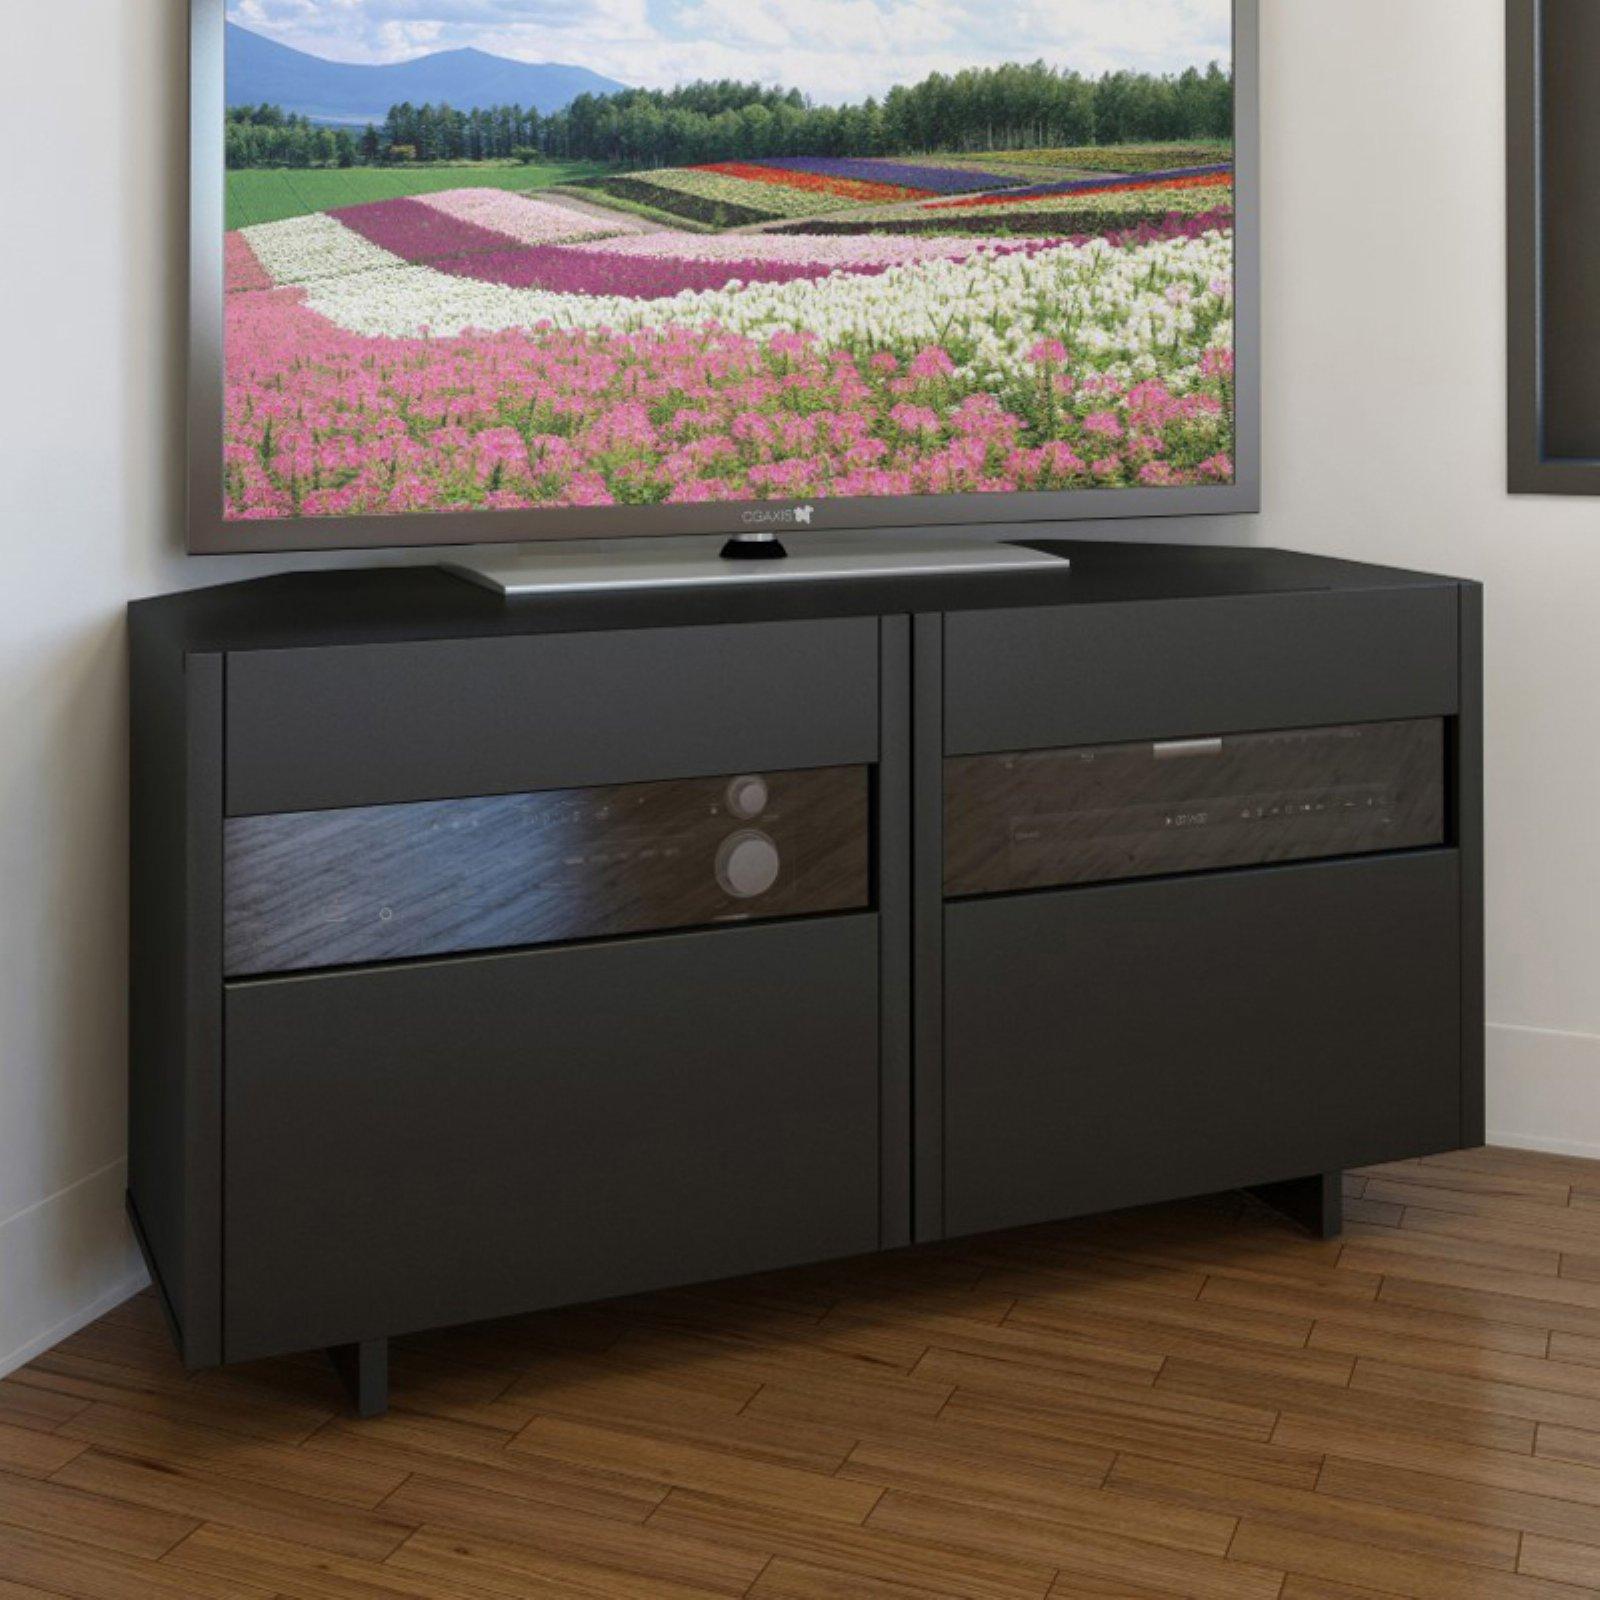 Nexera Vision 48 in. Corner TV Stand - Black